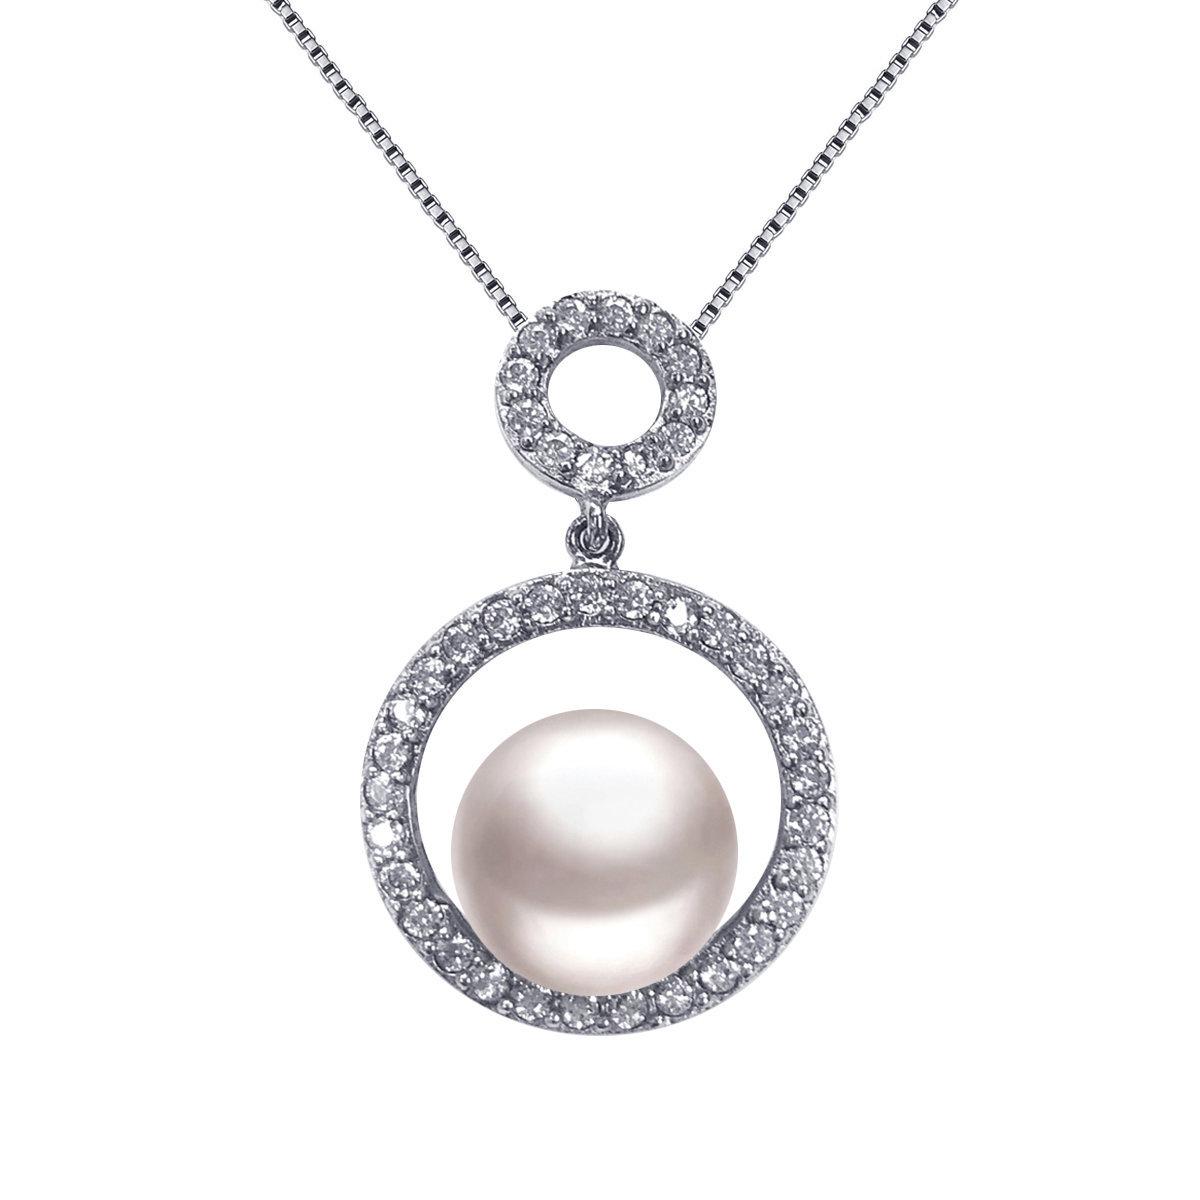 Secret- 925 純銀鑲白鋯石配養殖淡水珍珠吊墜連頸鏈